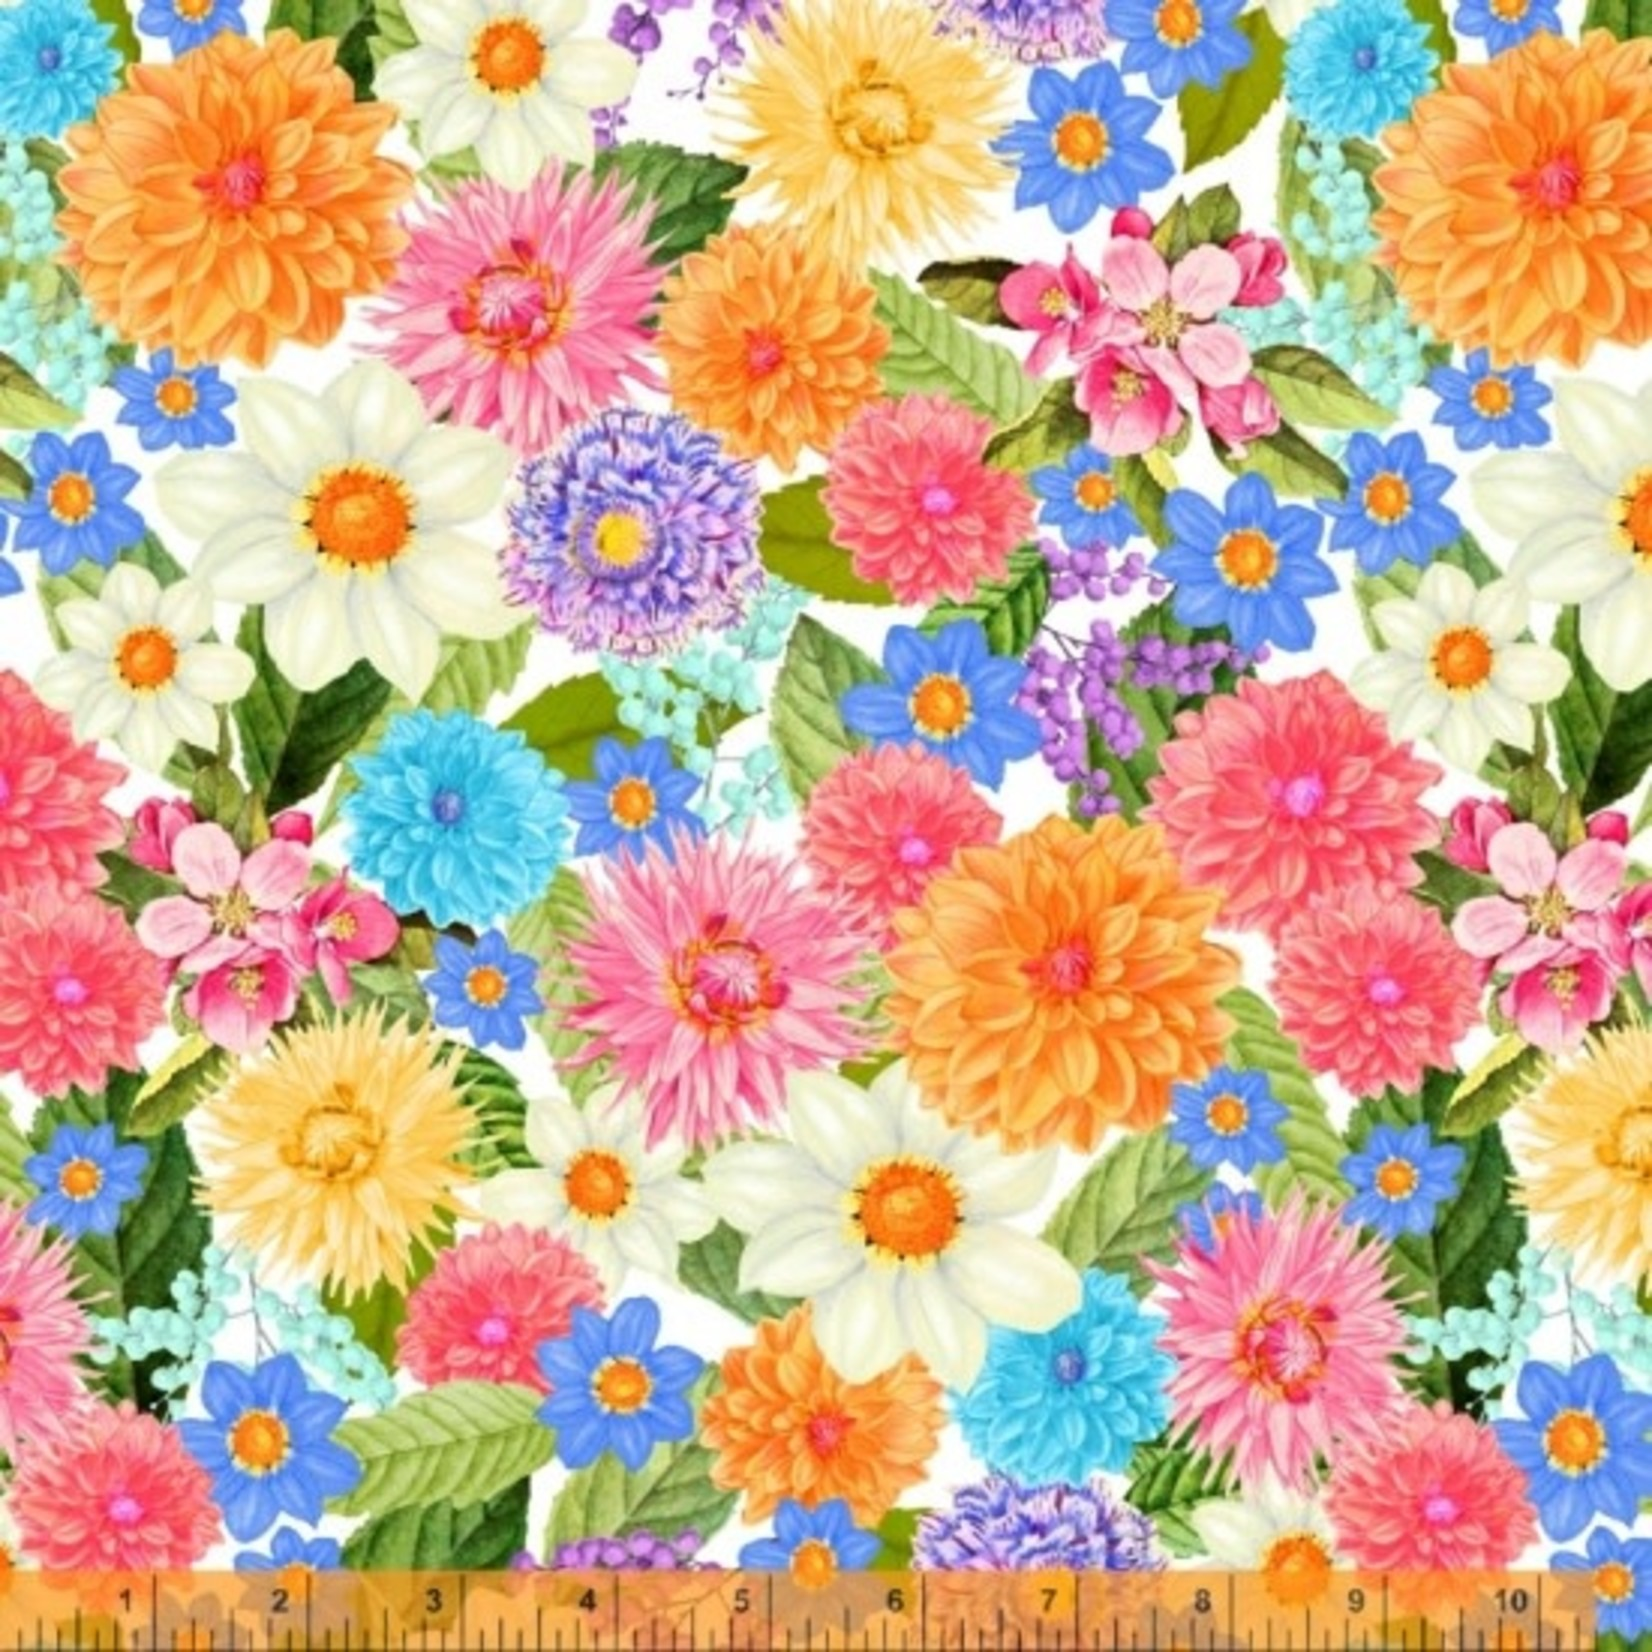 Windham Fabrics Flower Bed - Multi